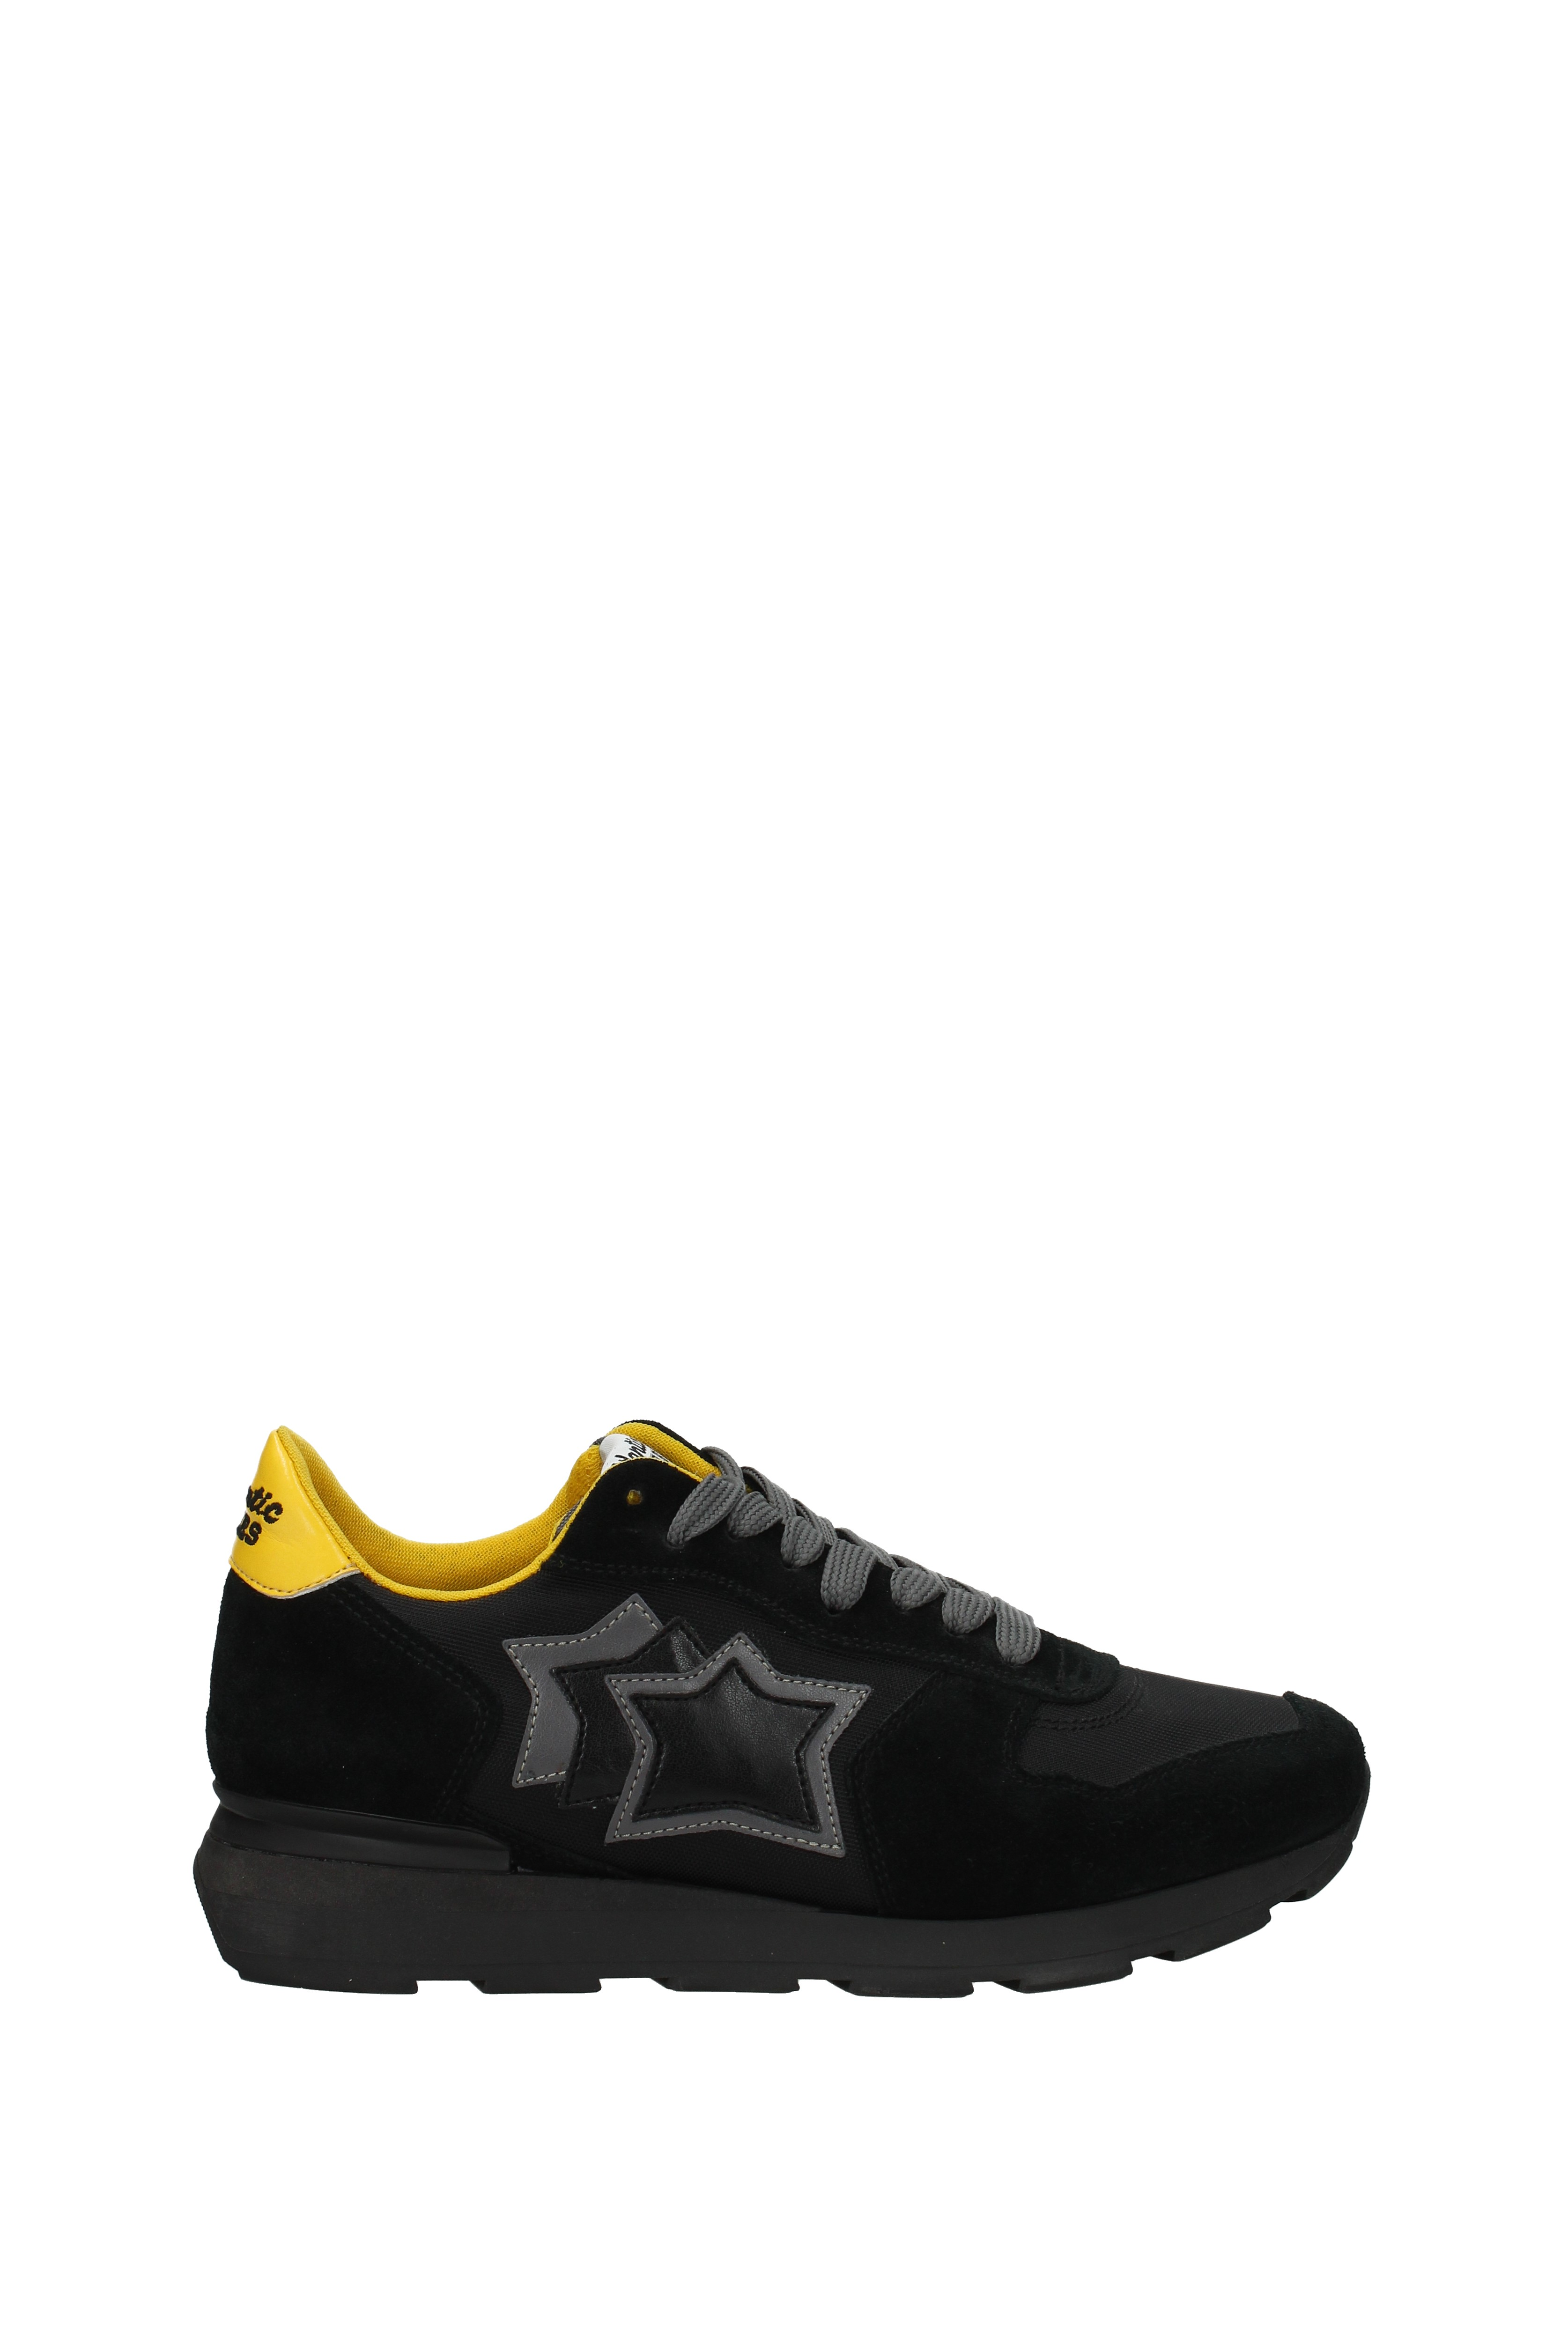 release date 67e35 ec31d ... Nike Air Jordan Jordan Jordan gold moment Retro 6 DS SIZE 12.5 (rare  Size) ...